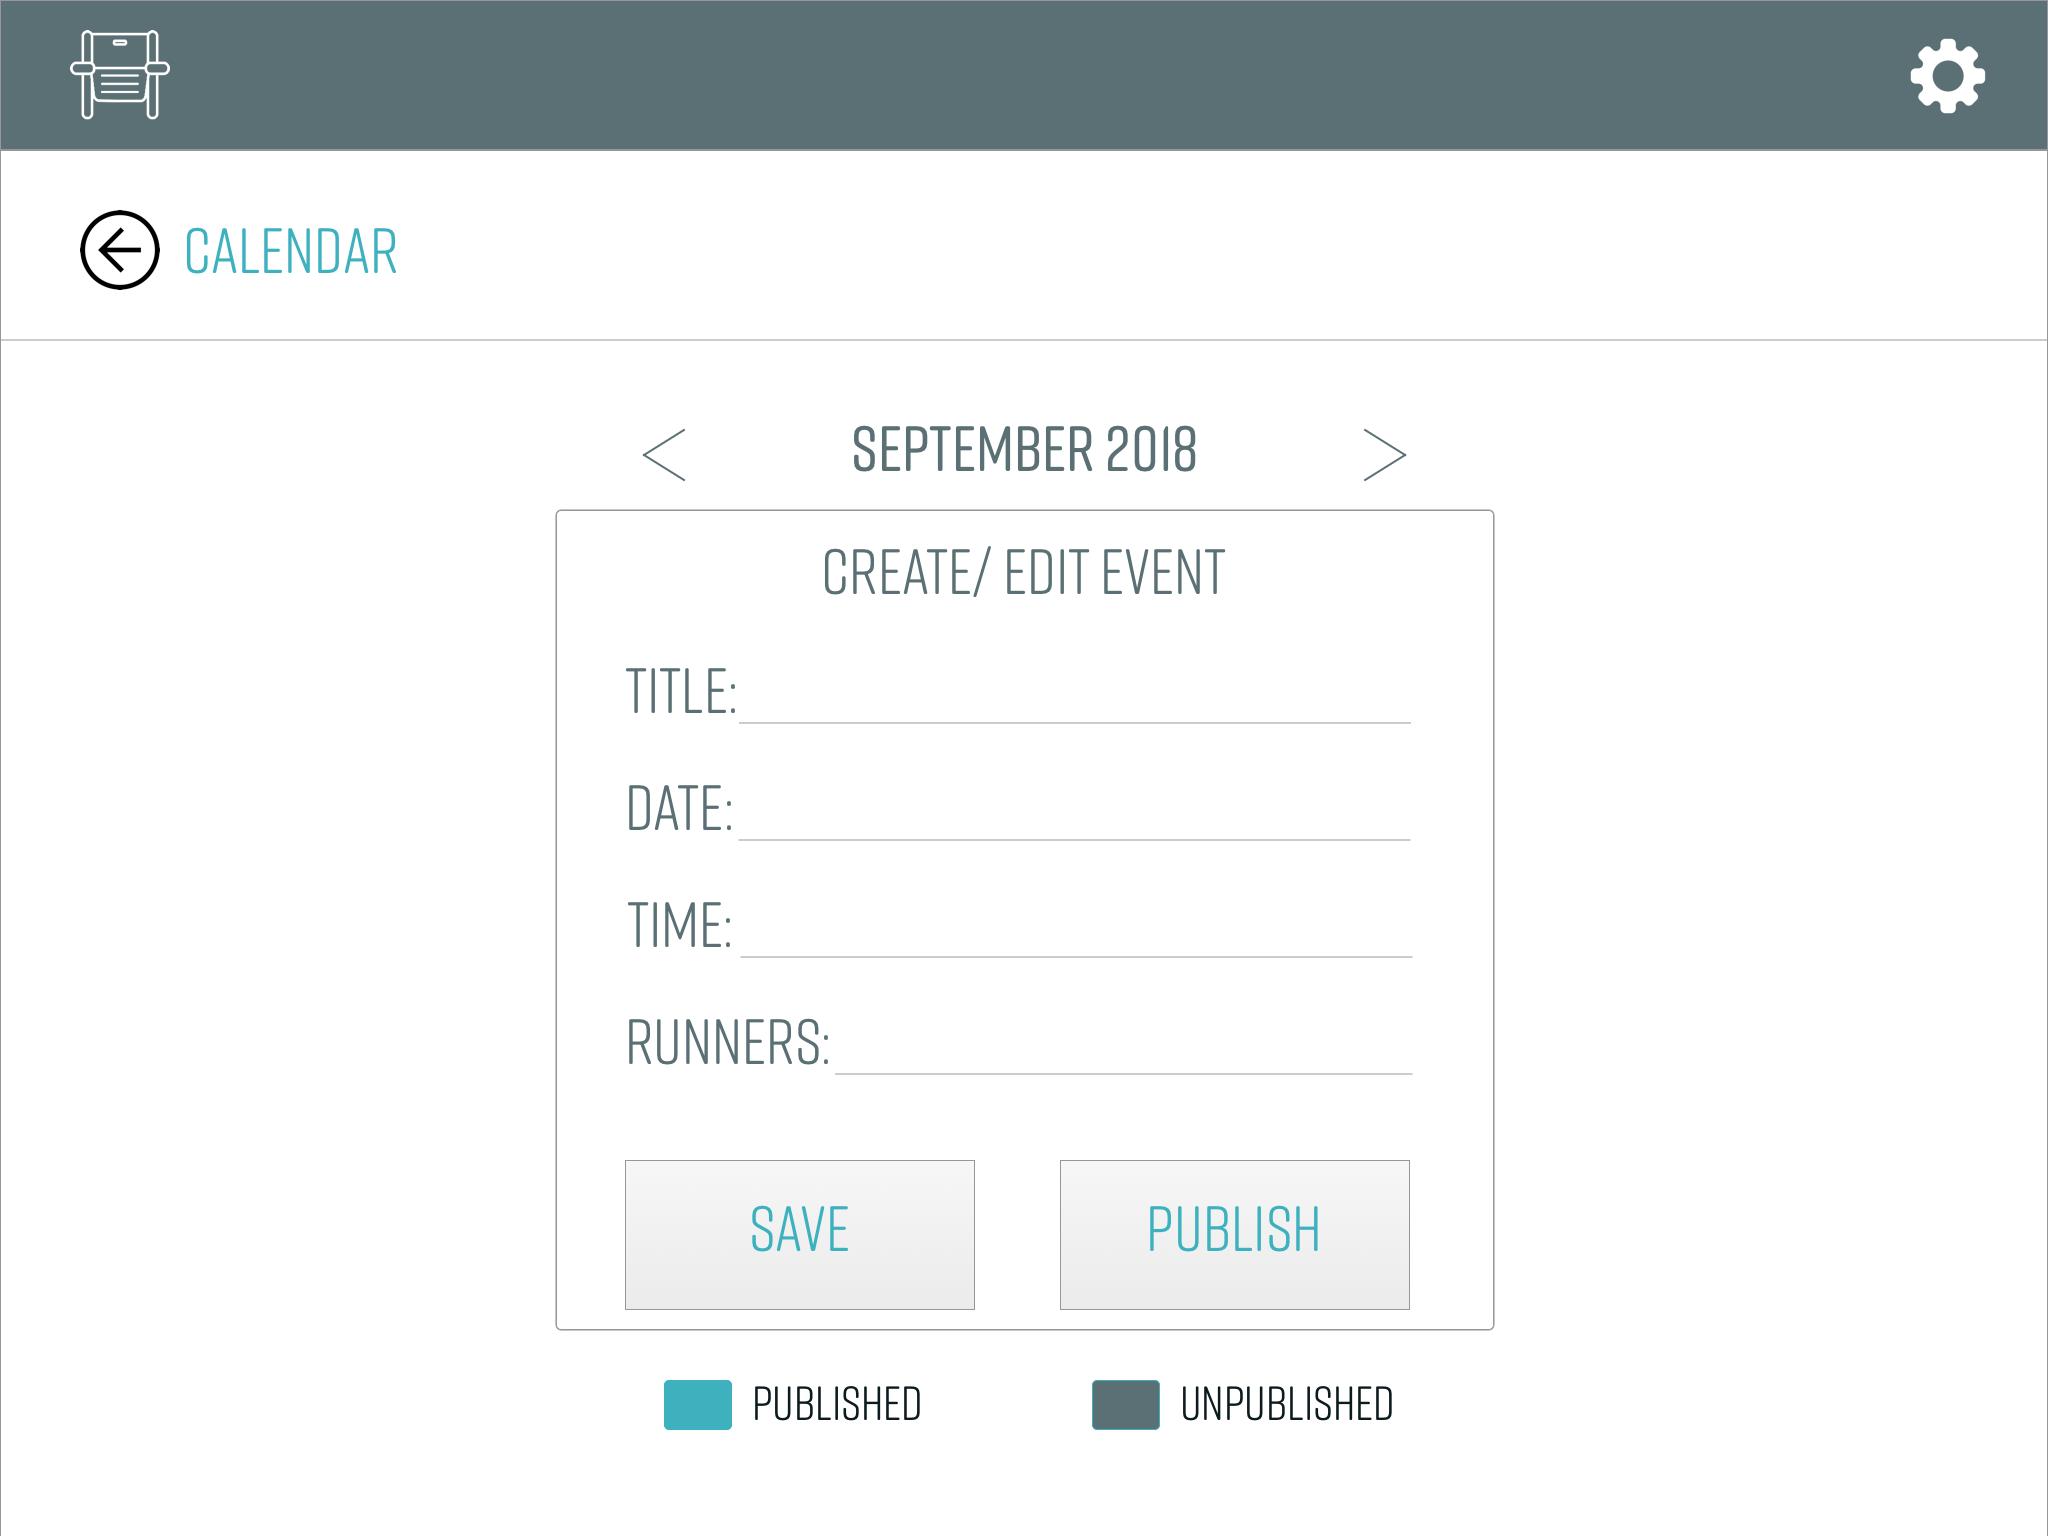 calendar create event.png